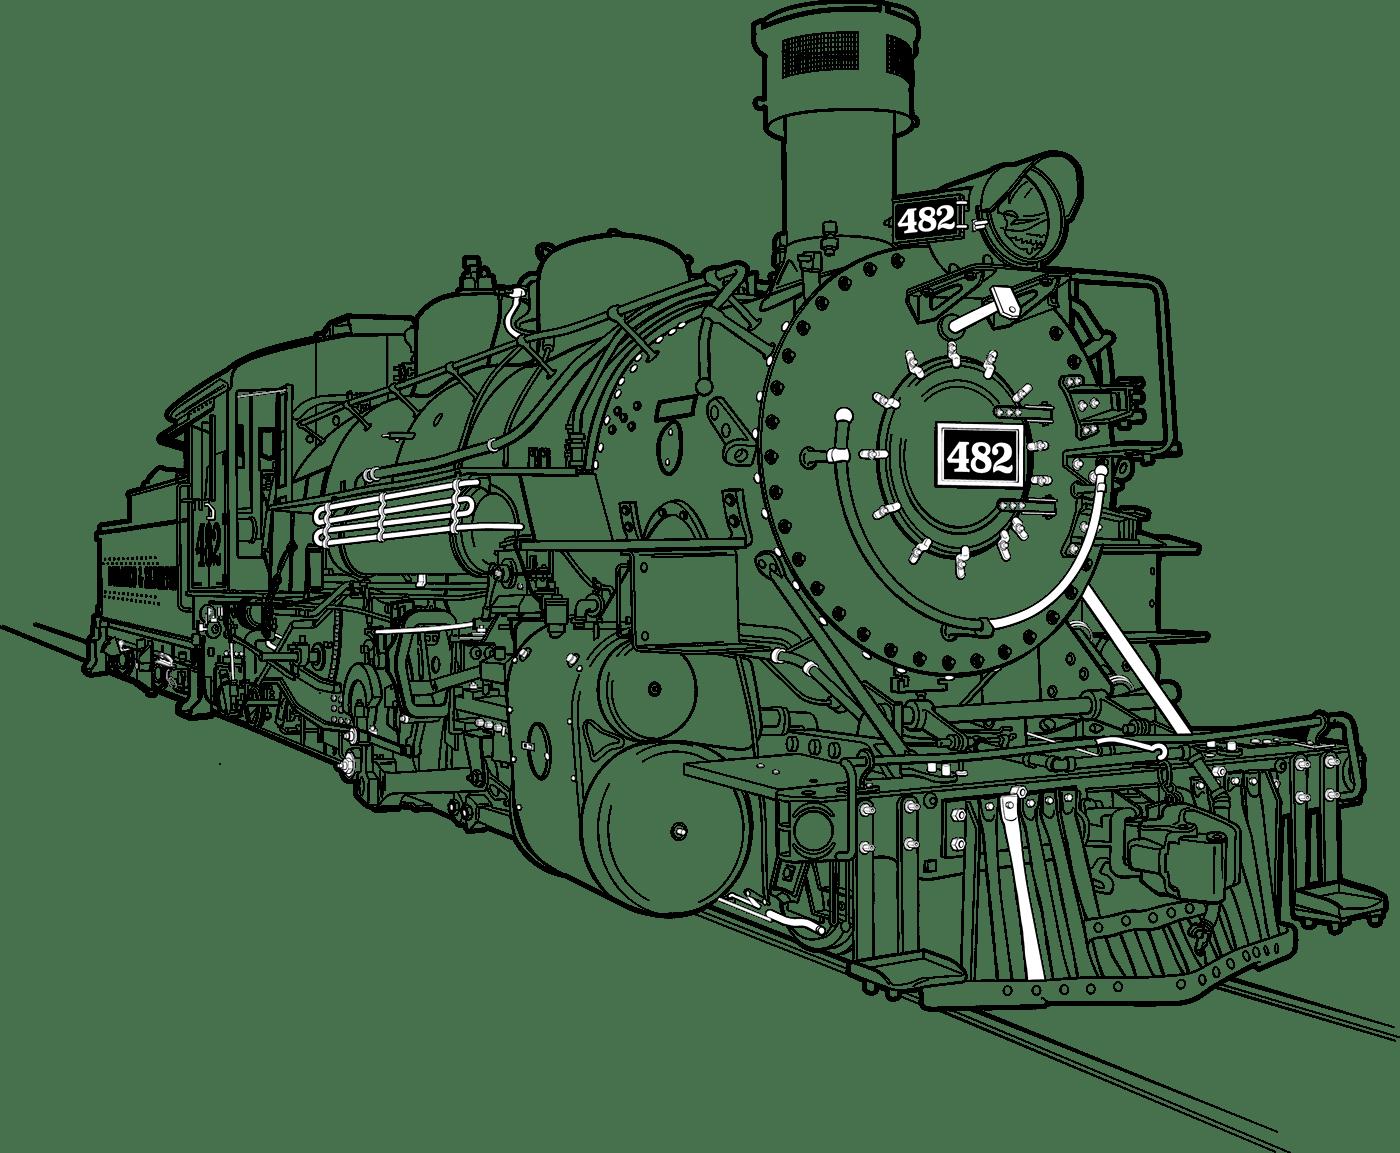 D Amp Sng 482 Steam Engine Line Art Tech Illustration On Behance